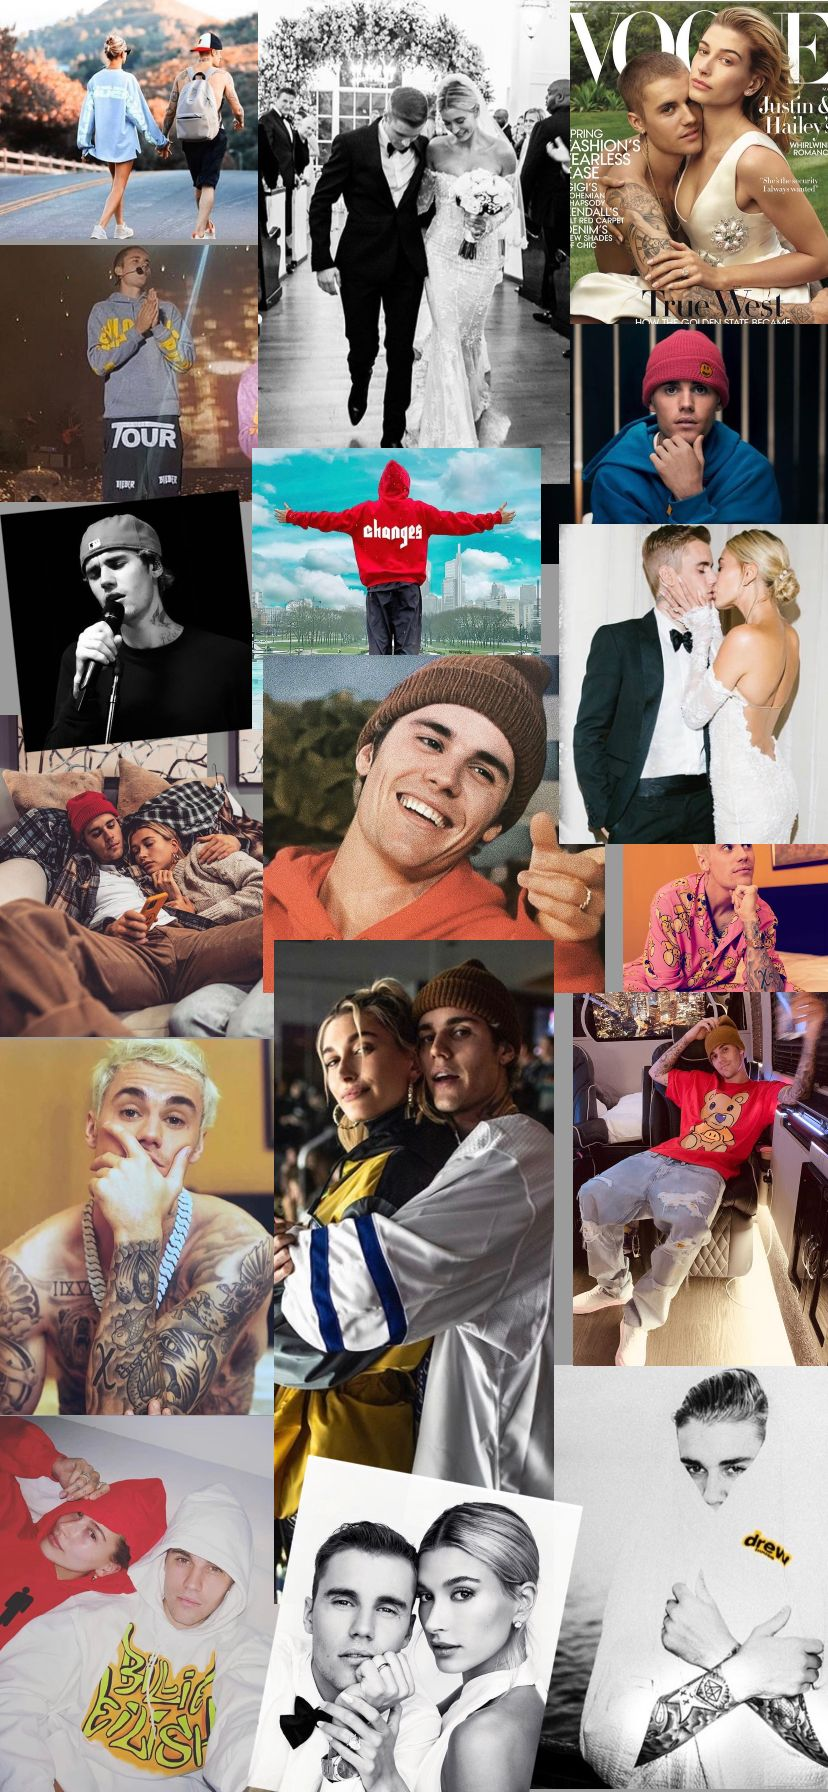 Mr And Mrs Bieber In 2020 Justin Bieber Wallpaper Iphone Wallpaper Justin Bieber Lockscreen